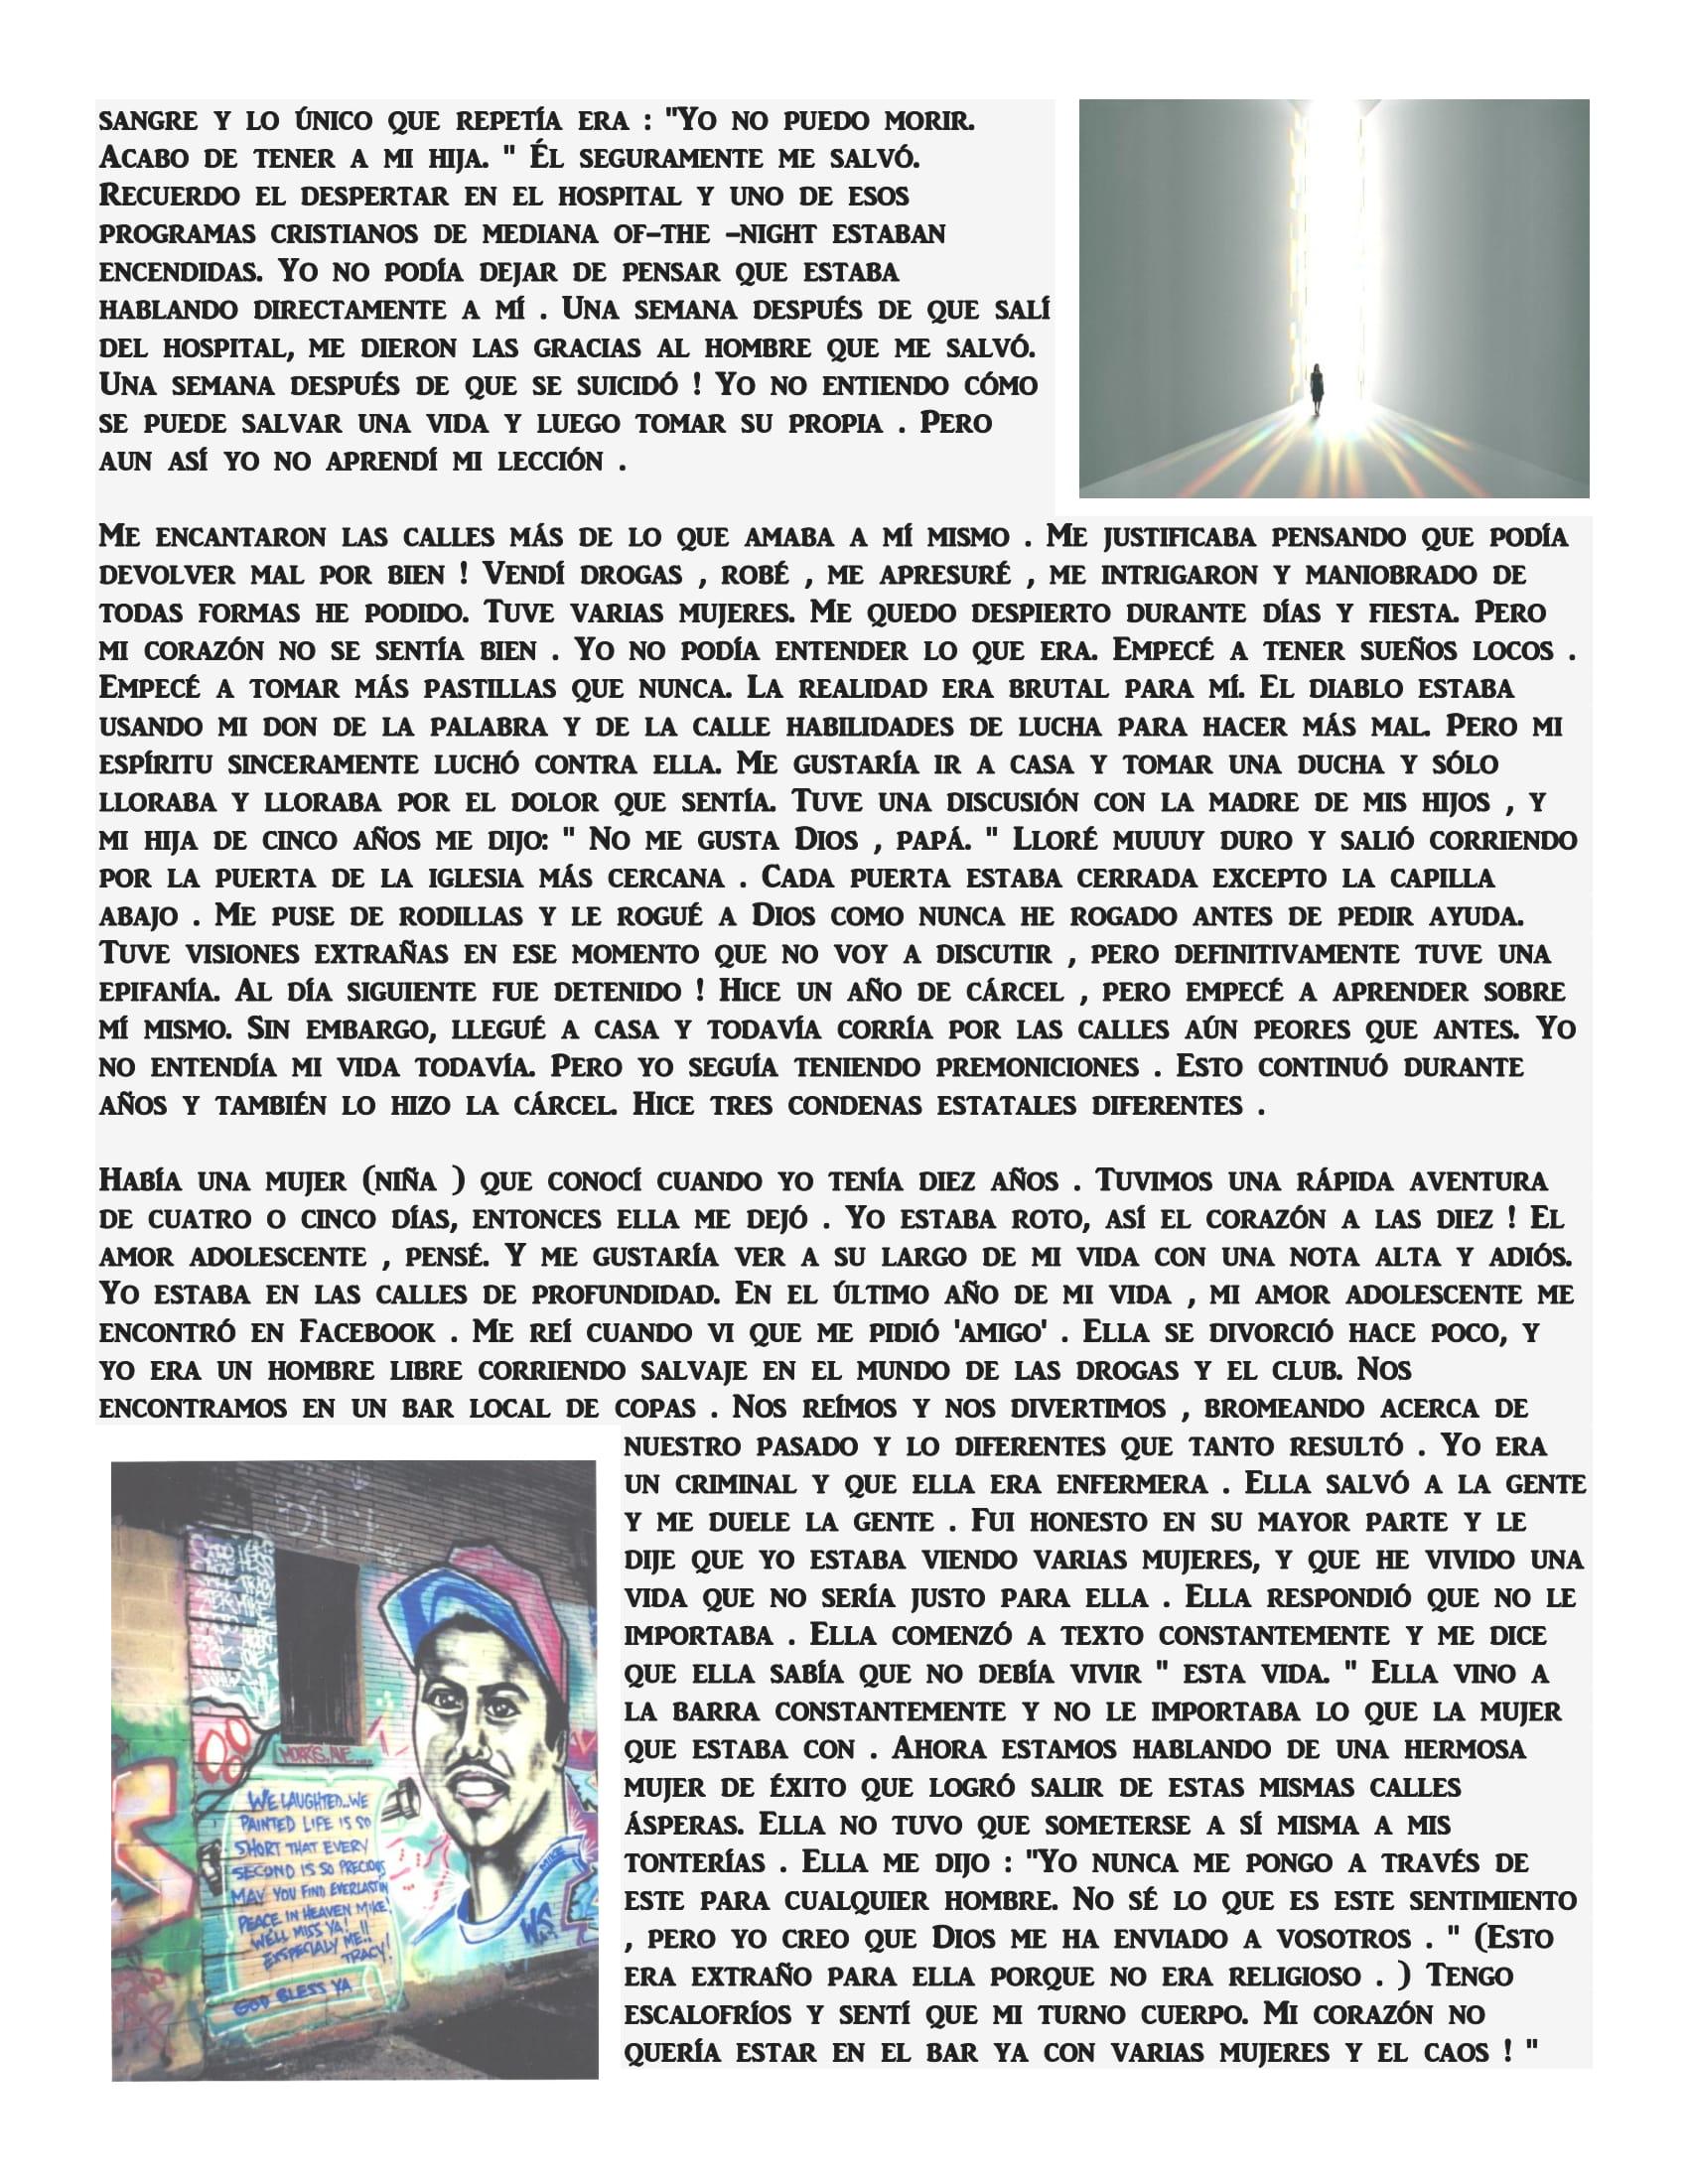 Voices From Prison 17 Spanish-2.jpg